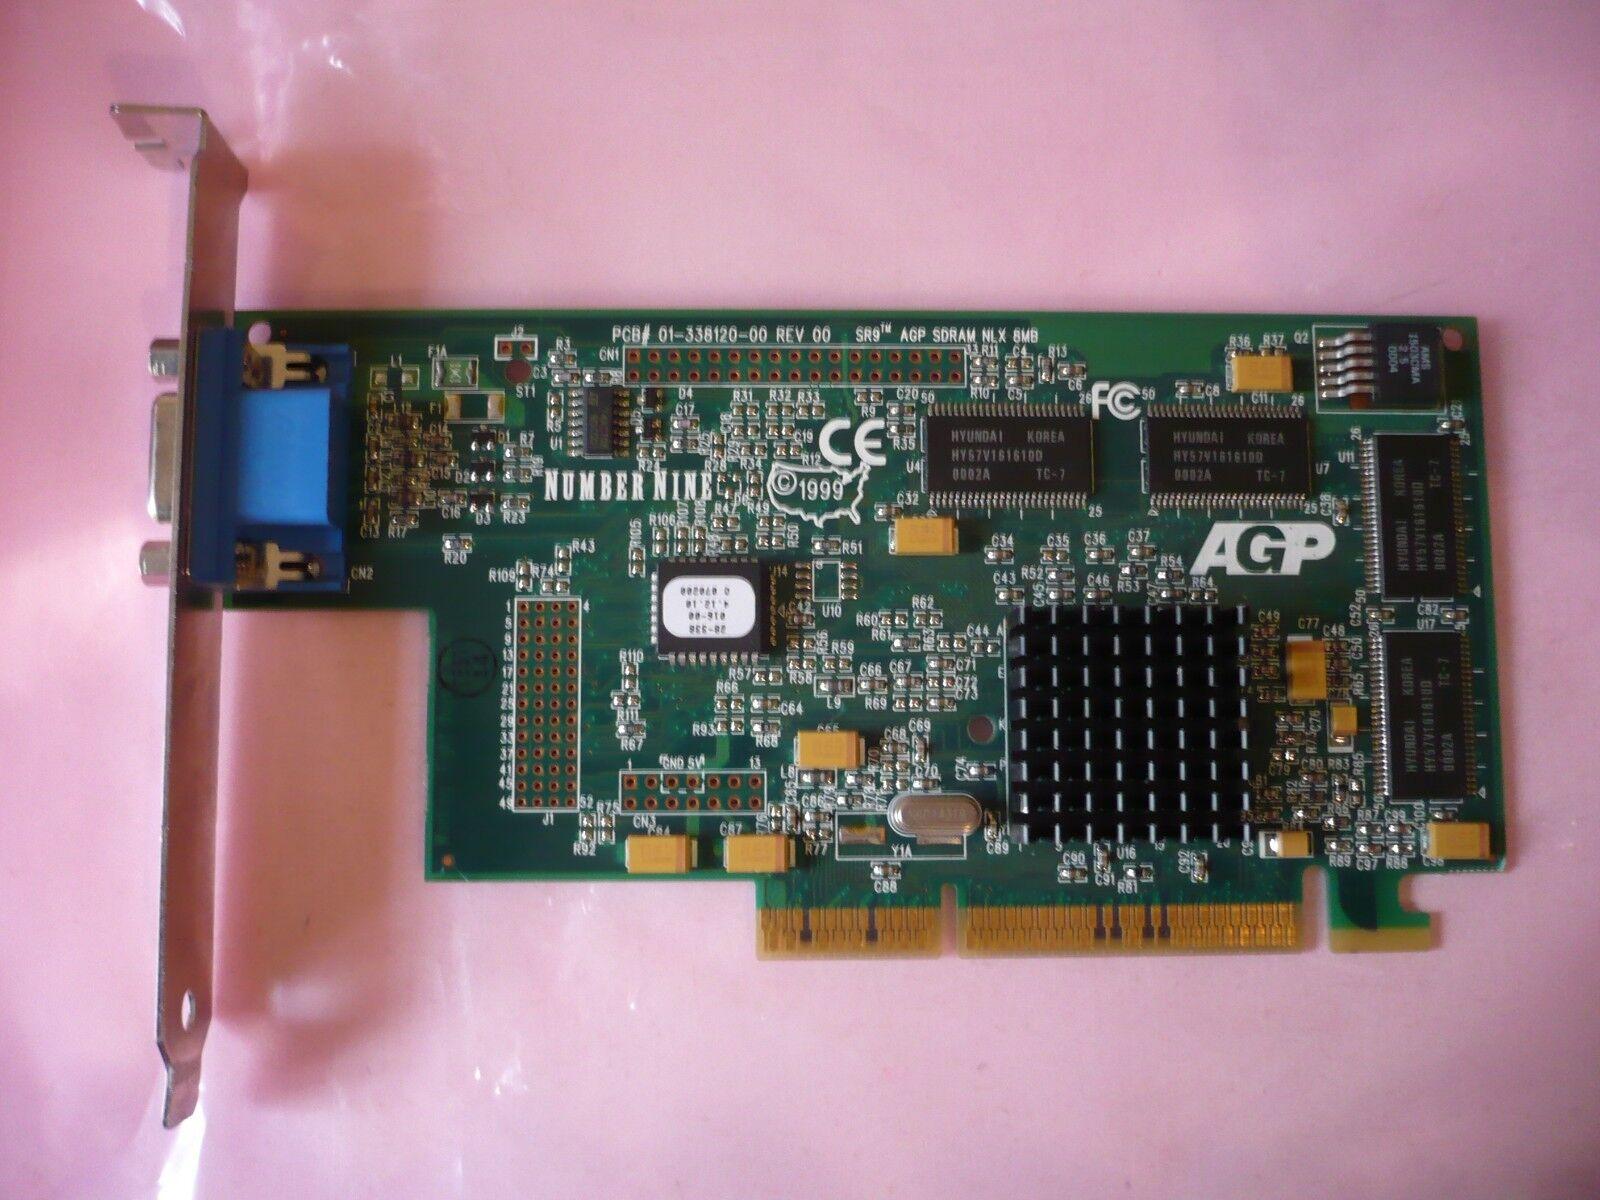 IBM 01-338120-00 8Mb AGP Video Card